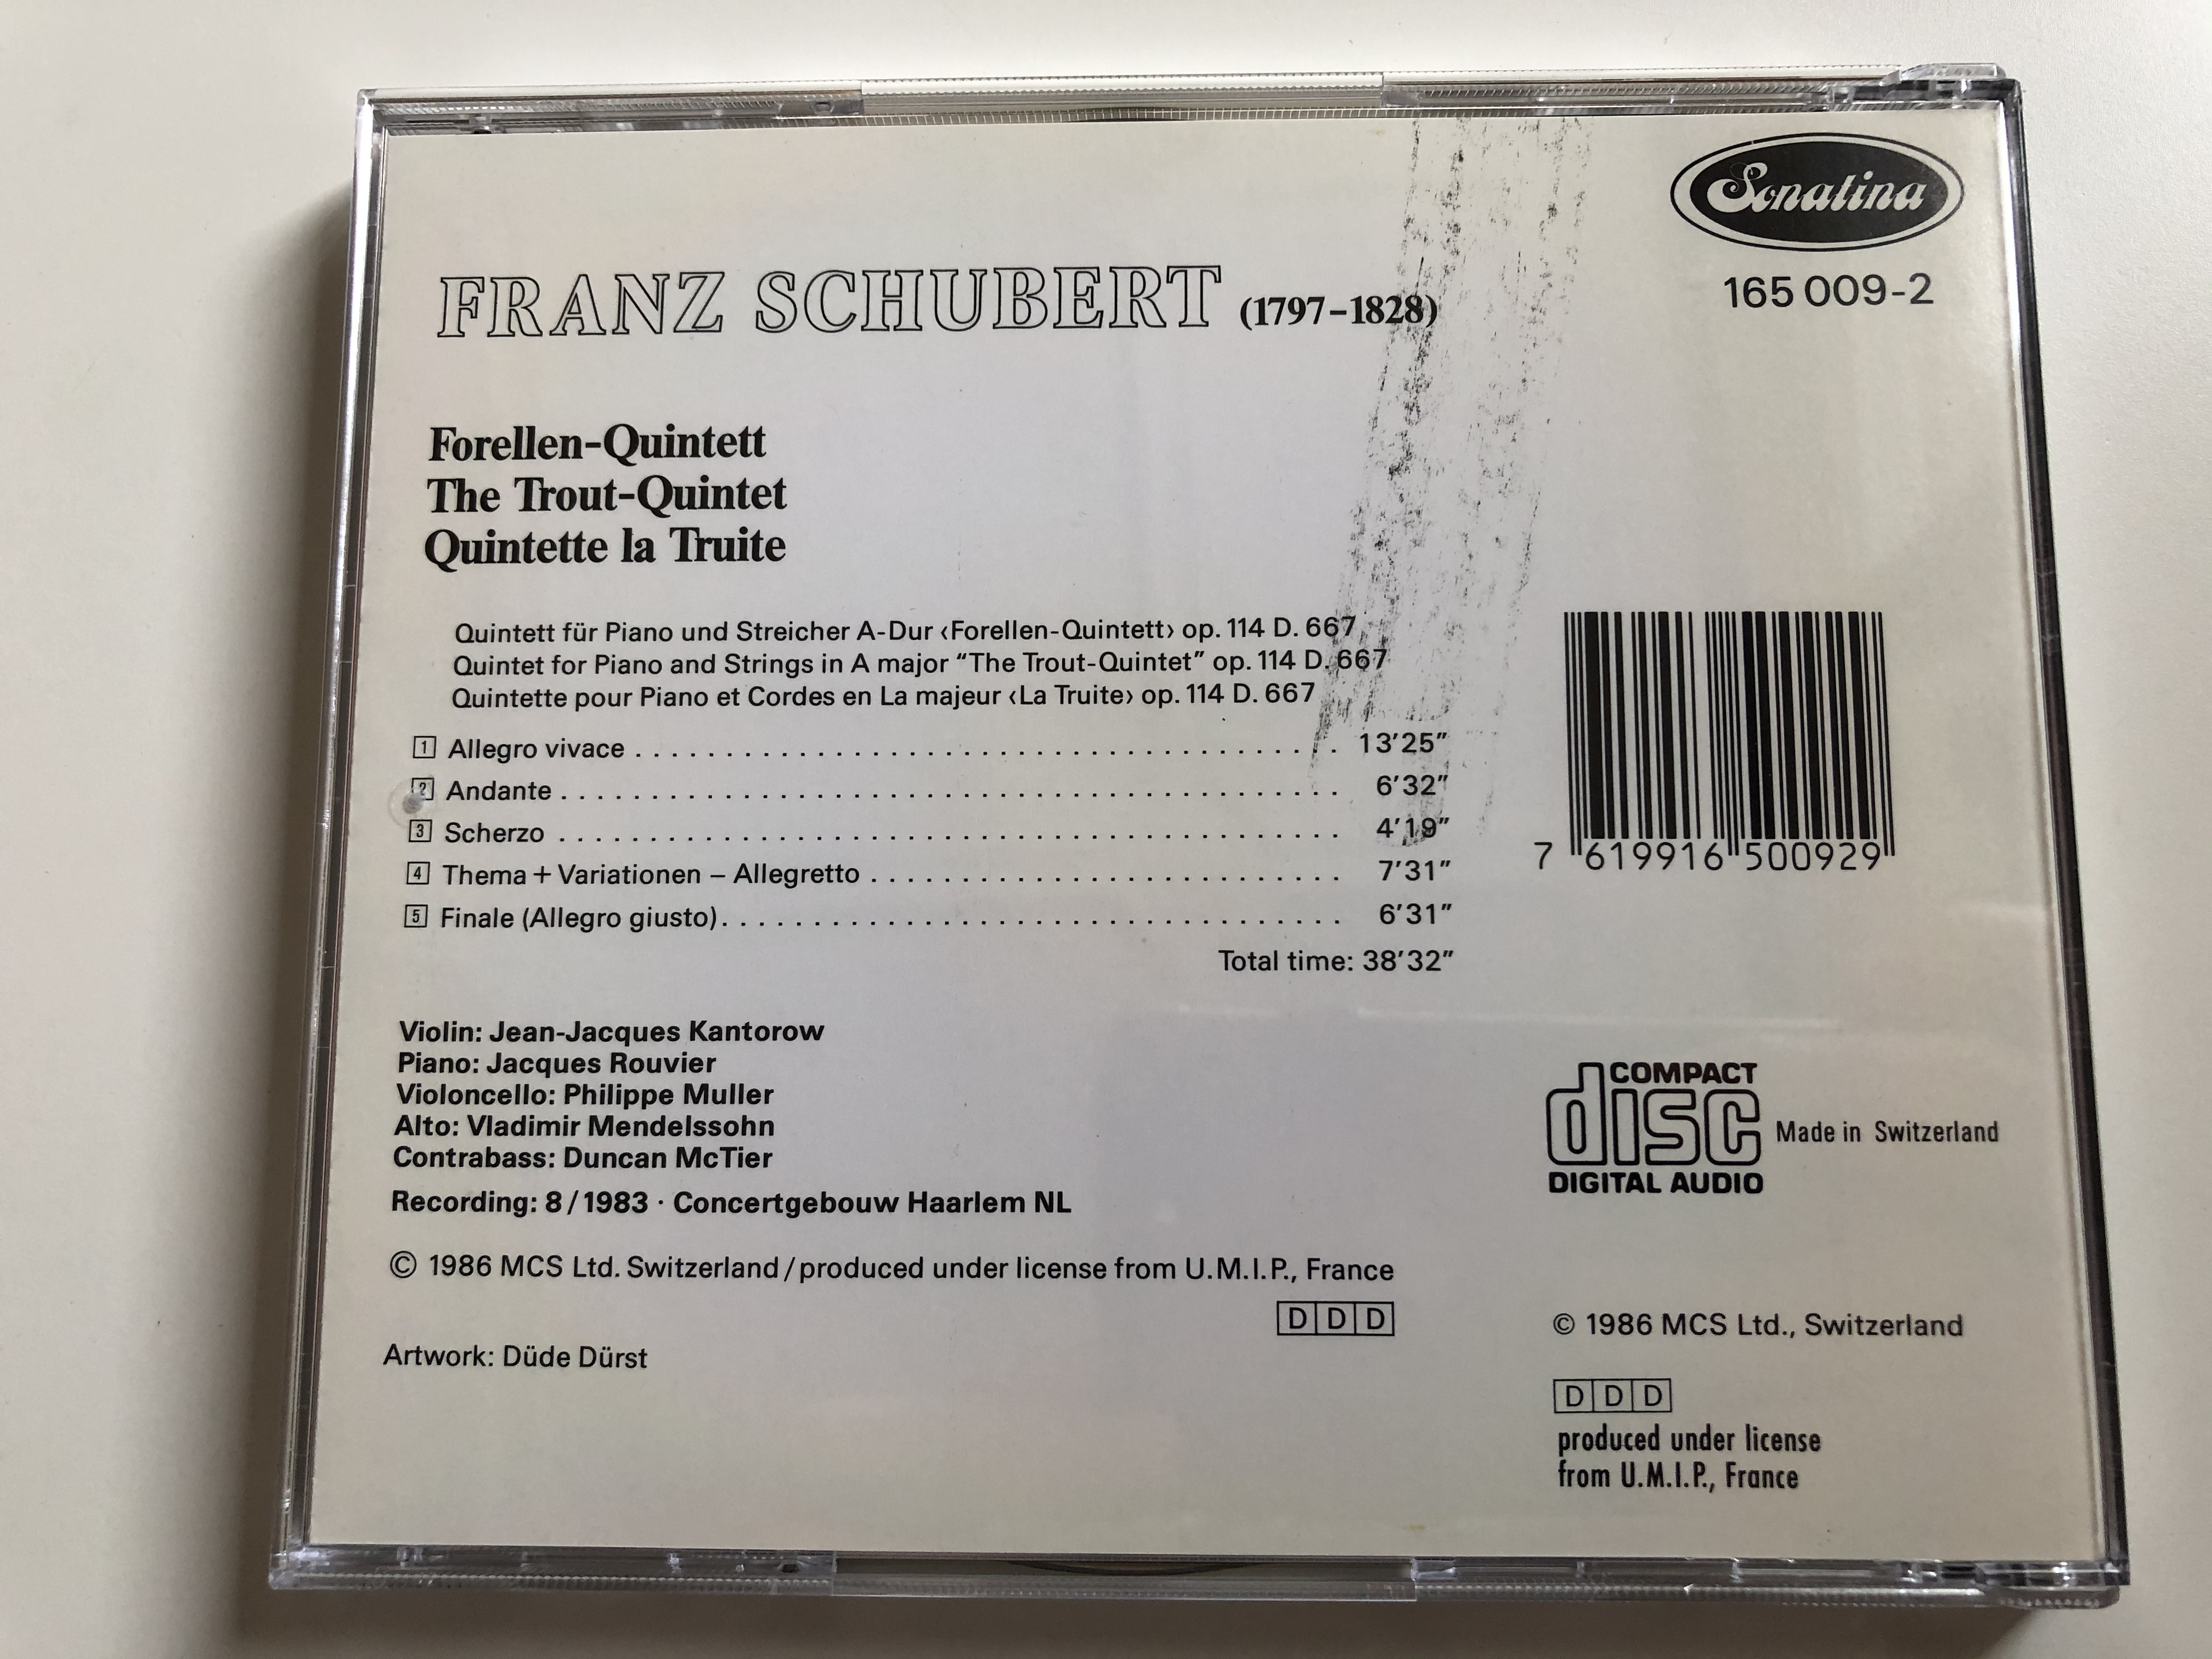 franz-schubert-forellen-quintett-the-trout-quintet-quintette-la-truite-sonatina-audio-cd-1986-stereo-165-009-2-3-.jpg